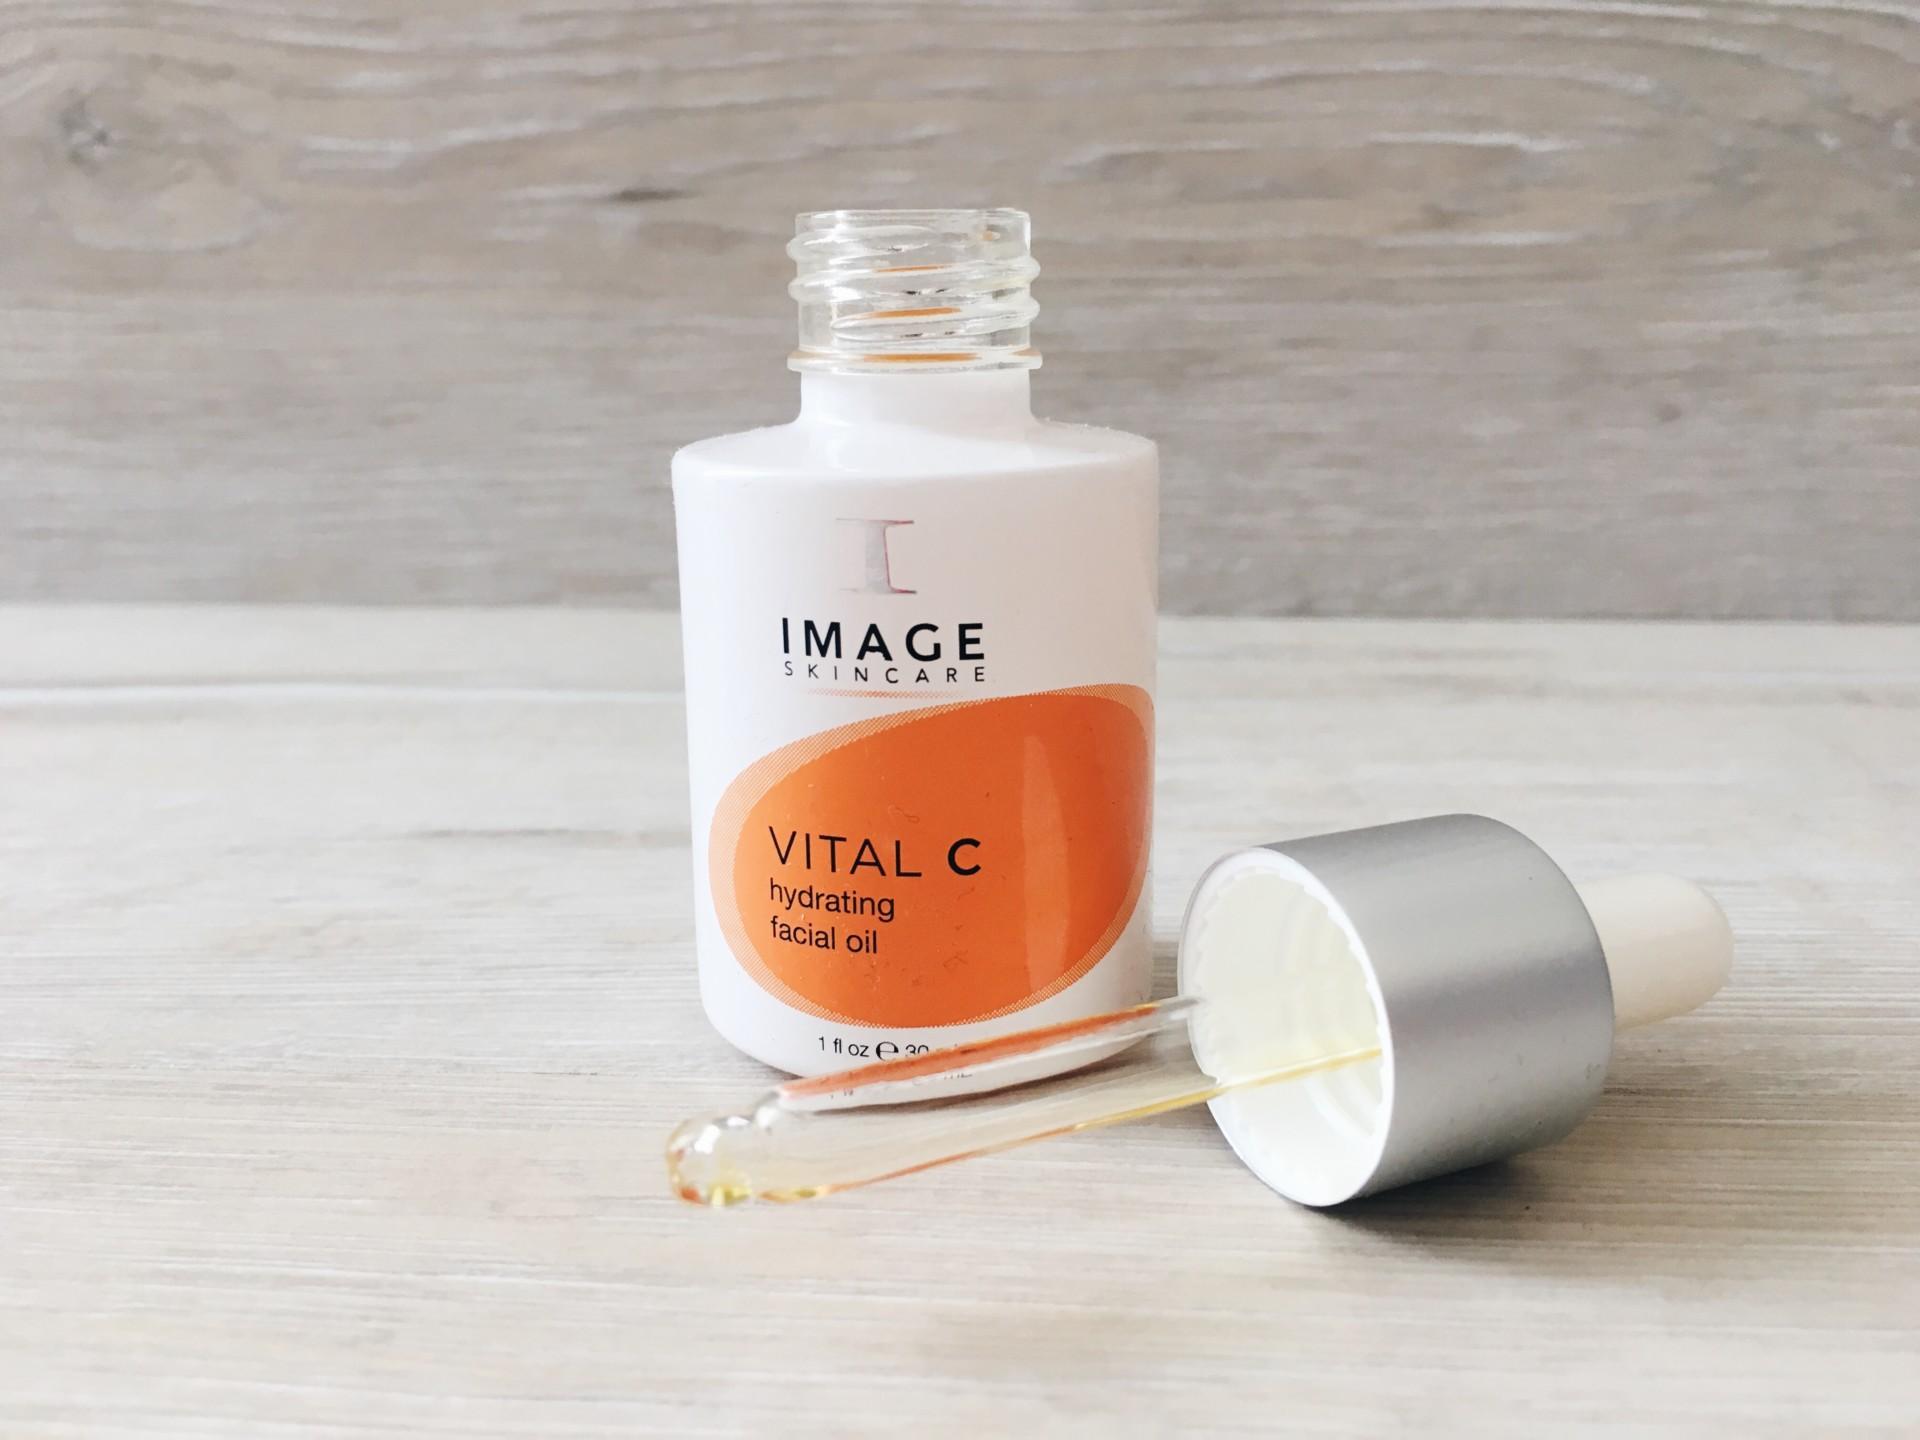 I_Image_Vital_C_skincare_pflege_beautyblog_dbkstylez_best_blog_бьюти_уход